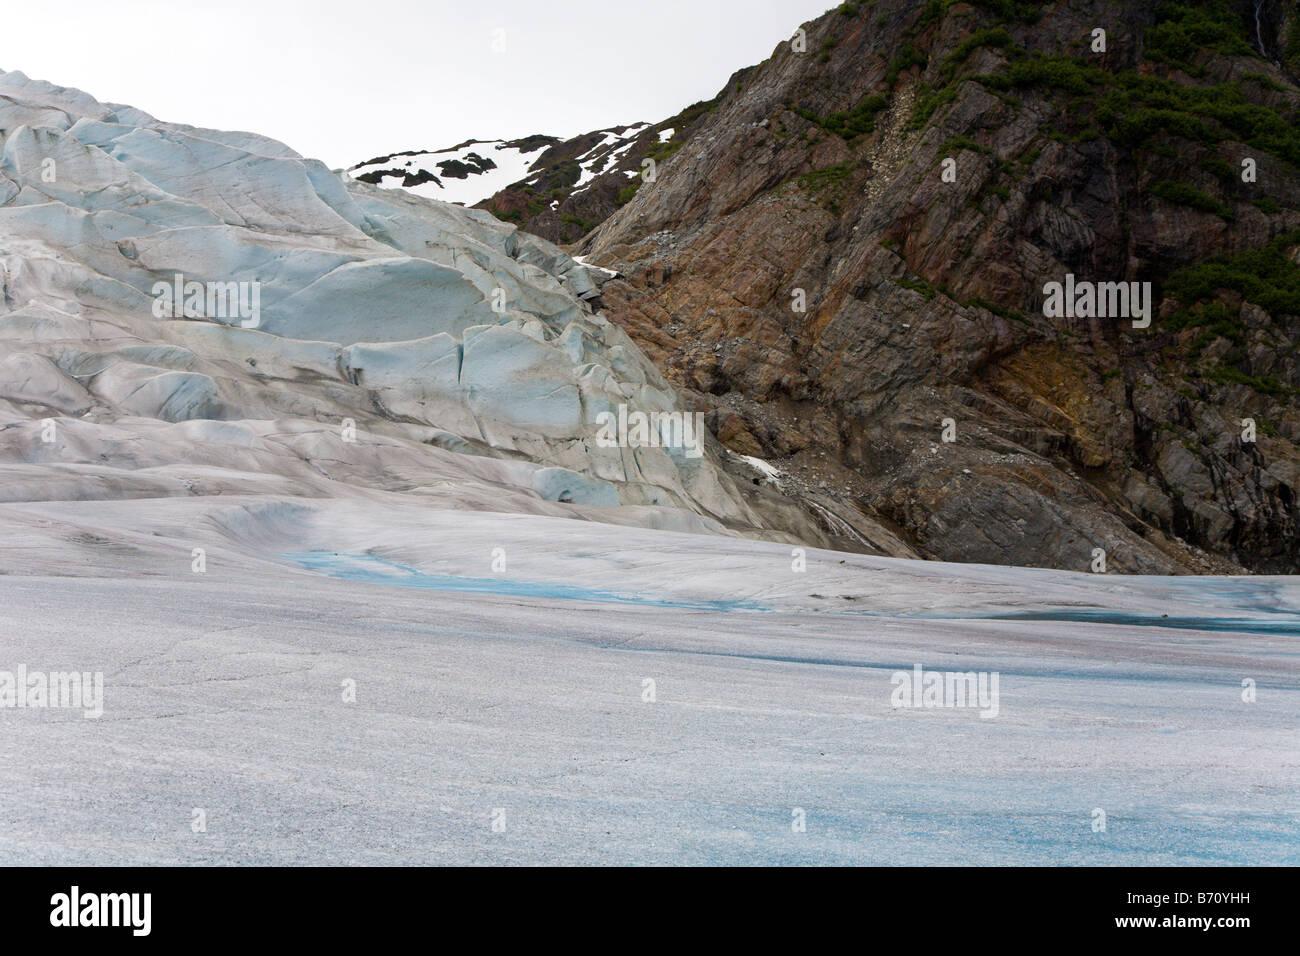 Mendenhall Glacier presses against mountains of rock near Juneau, Alaska - Stock Image